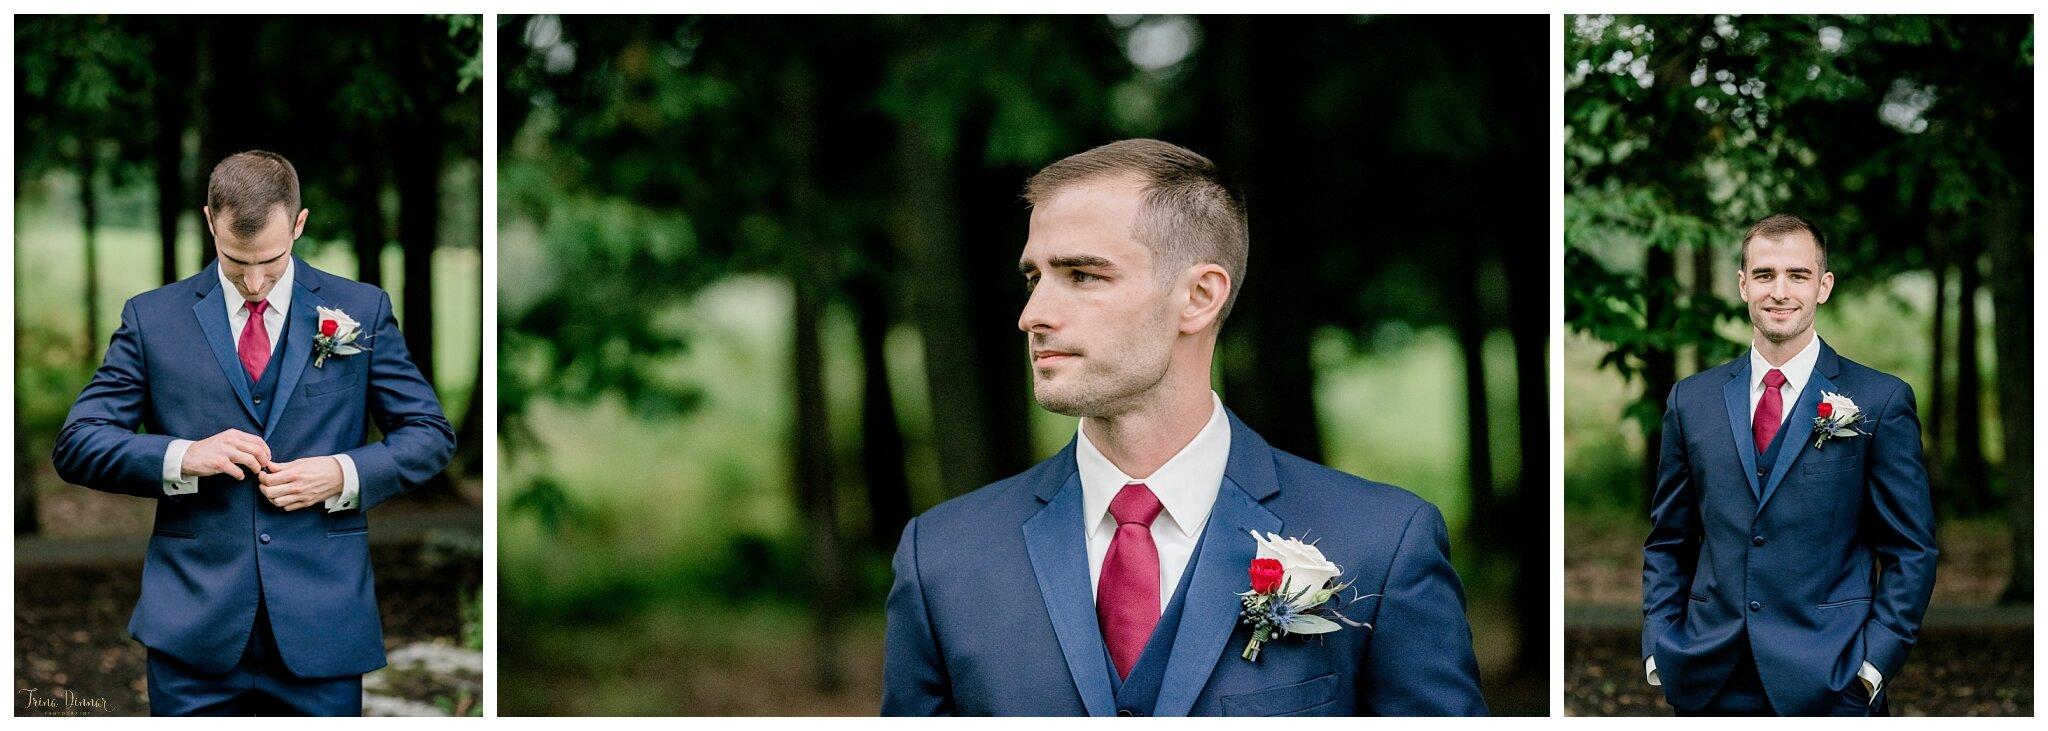 Maine Groom Wedding Day Portraits